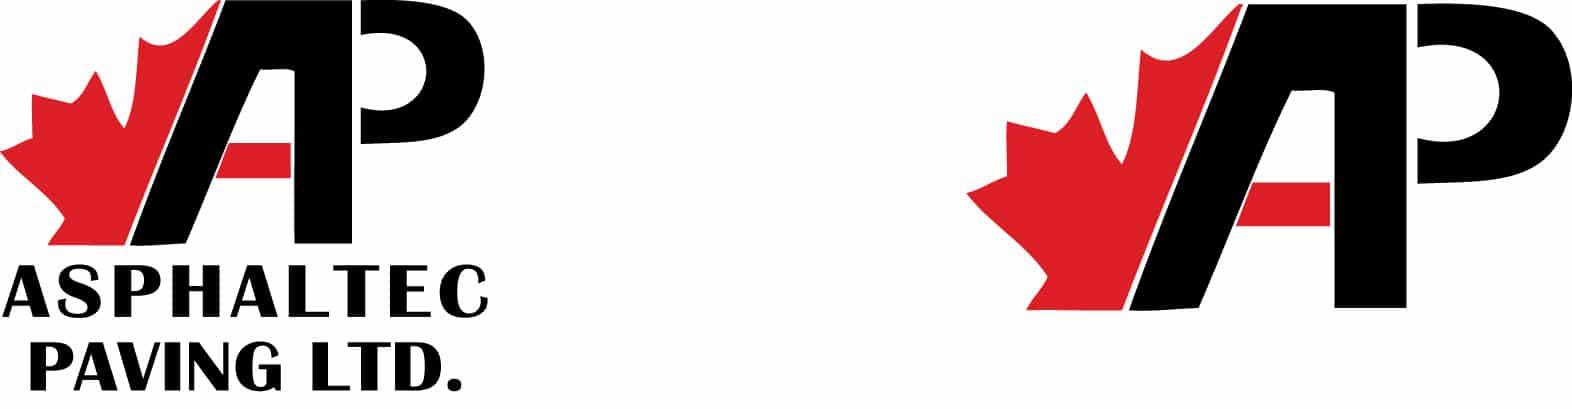 Asphaltec logo (1)